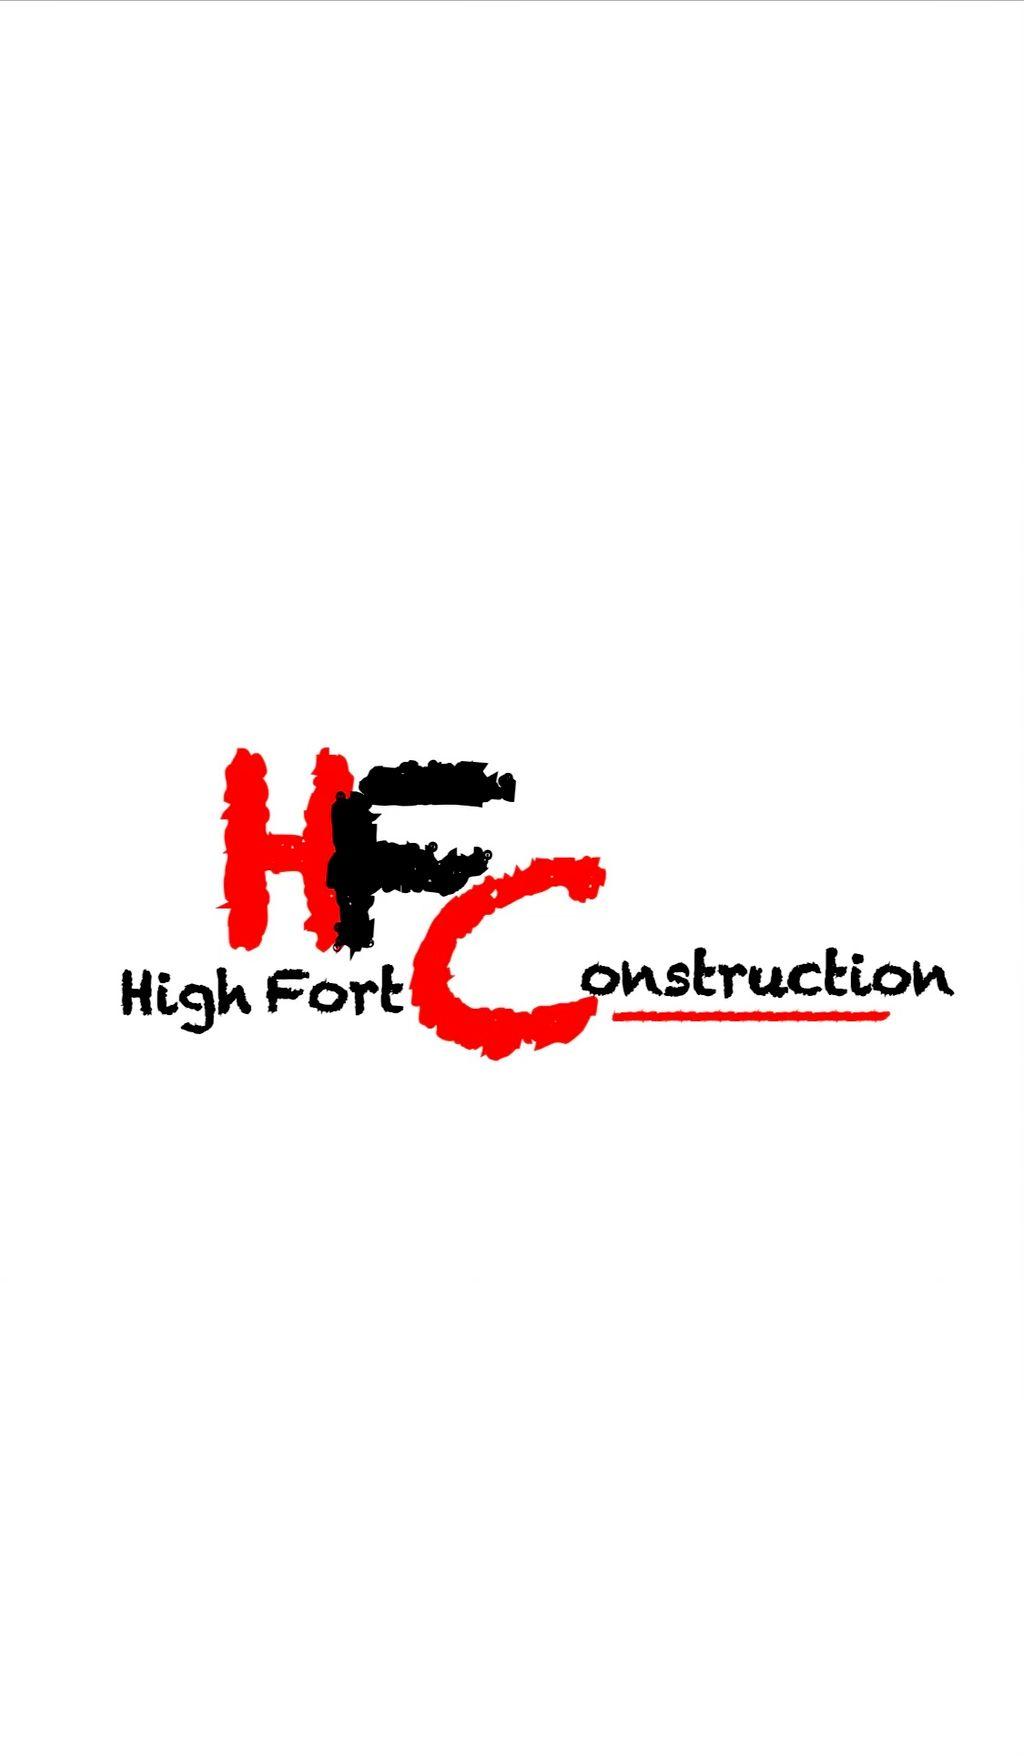 HighFort Construction of New York